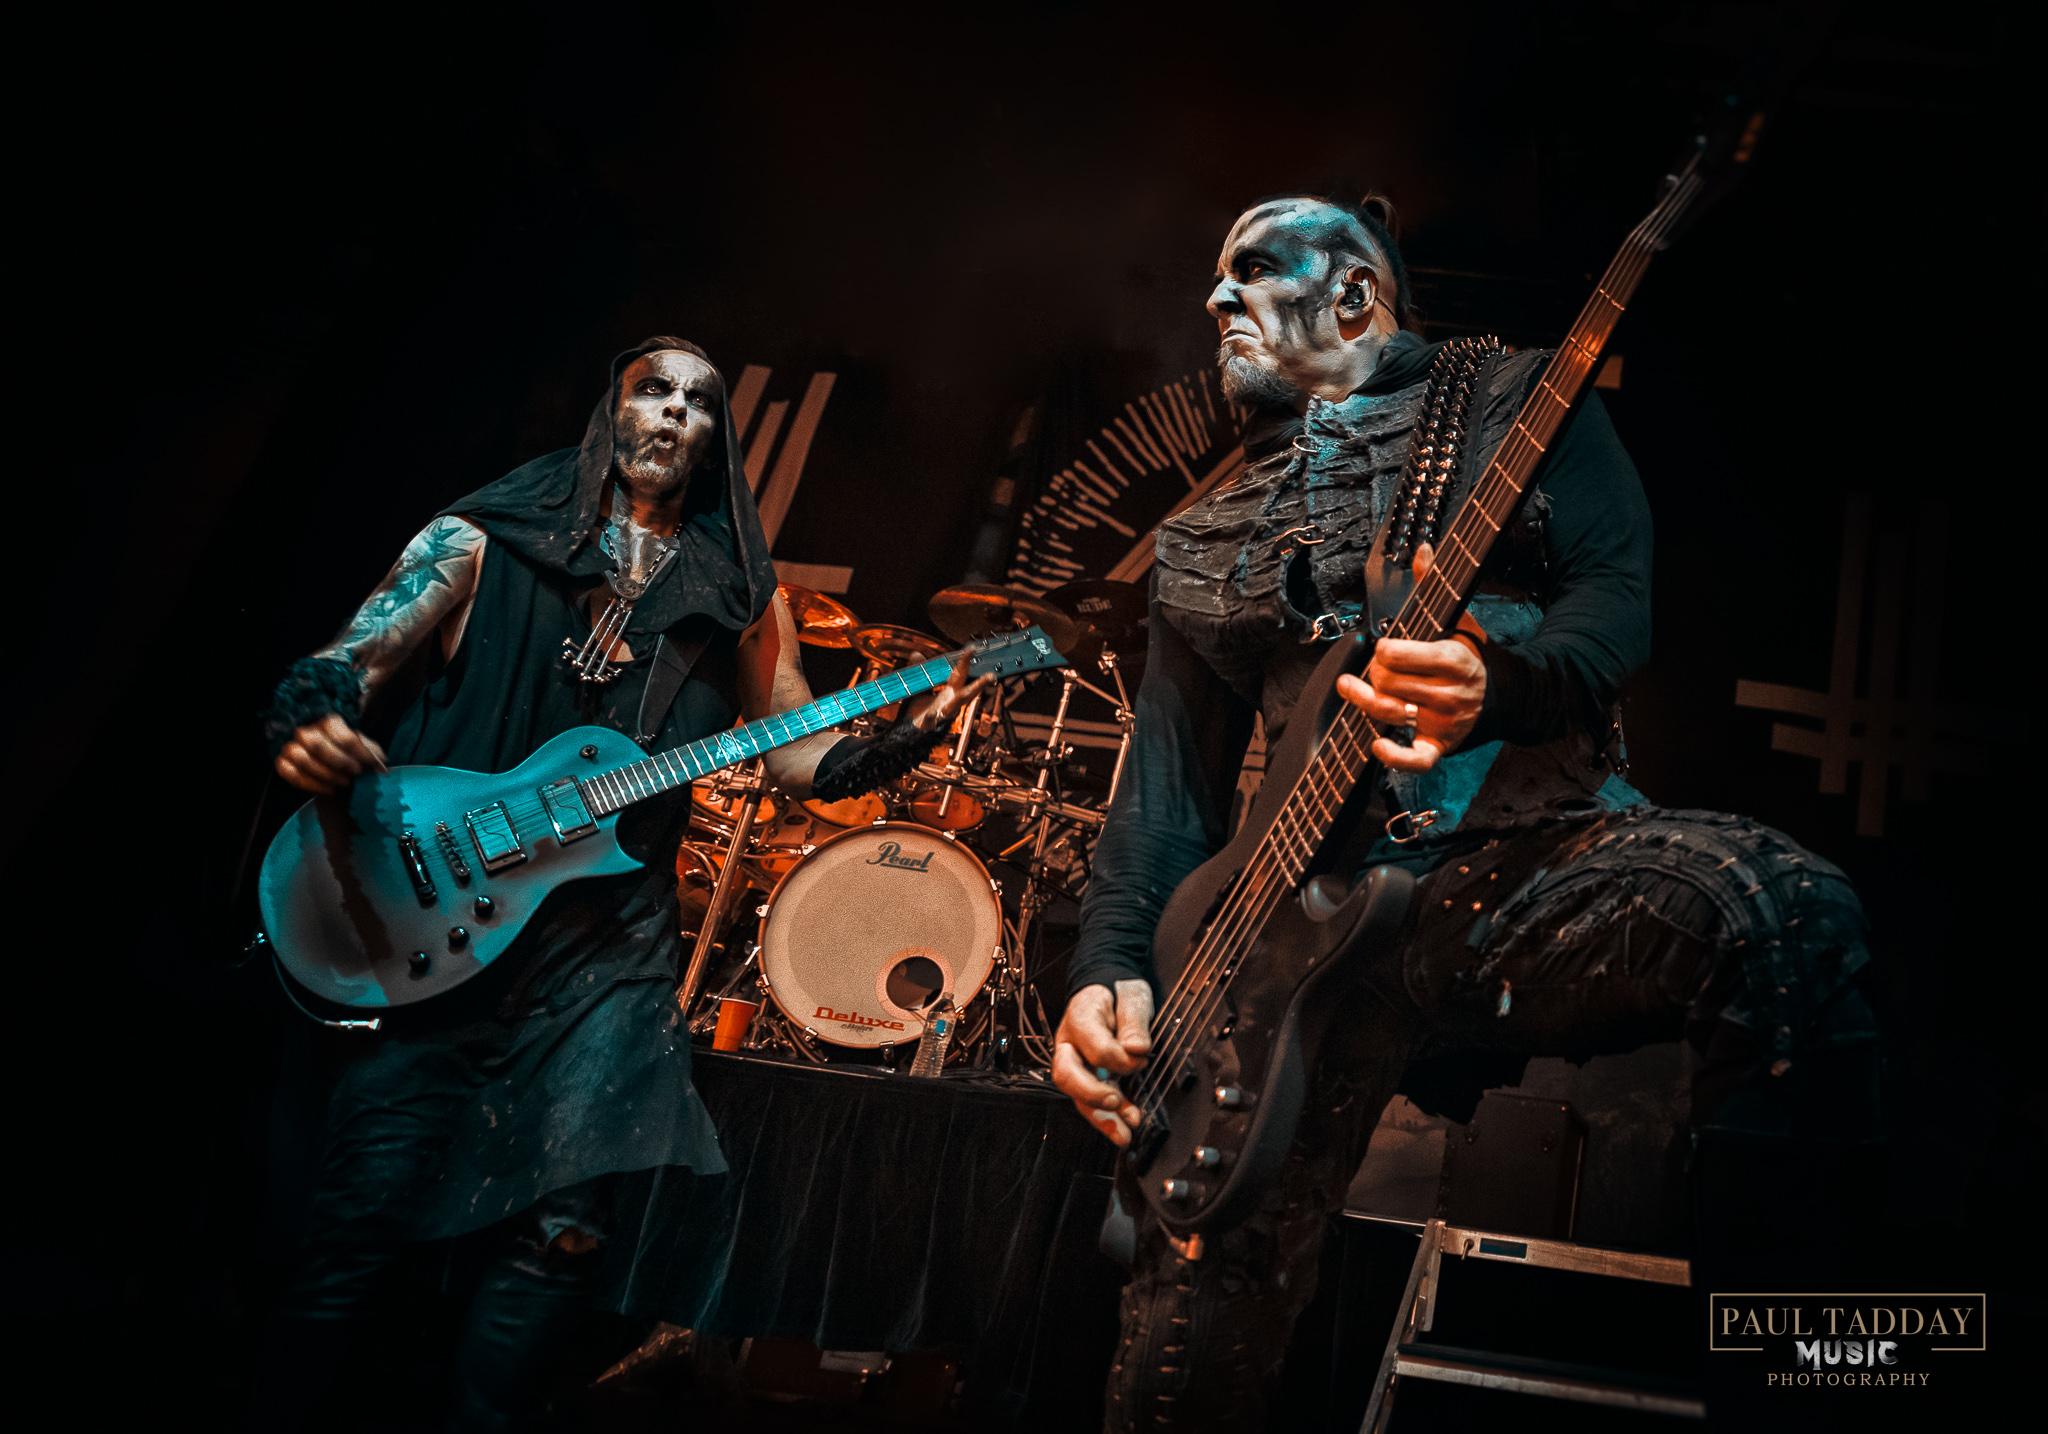 behemoth - brisbane - march 7 2019 - web - paul tadday photography - 26.jpg